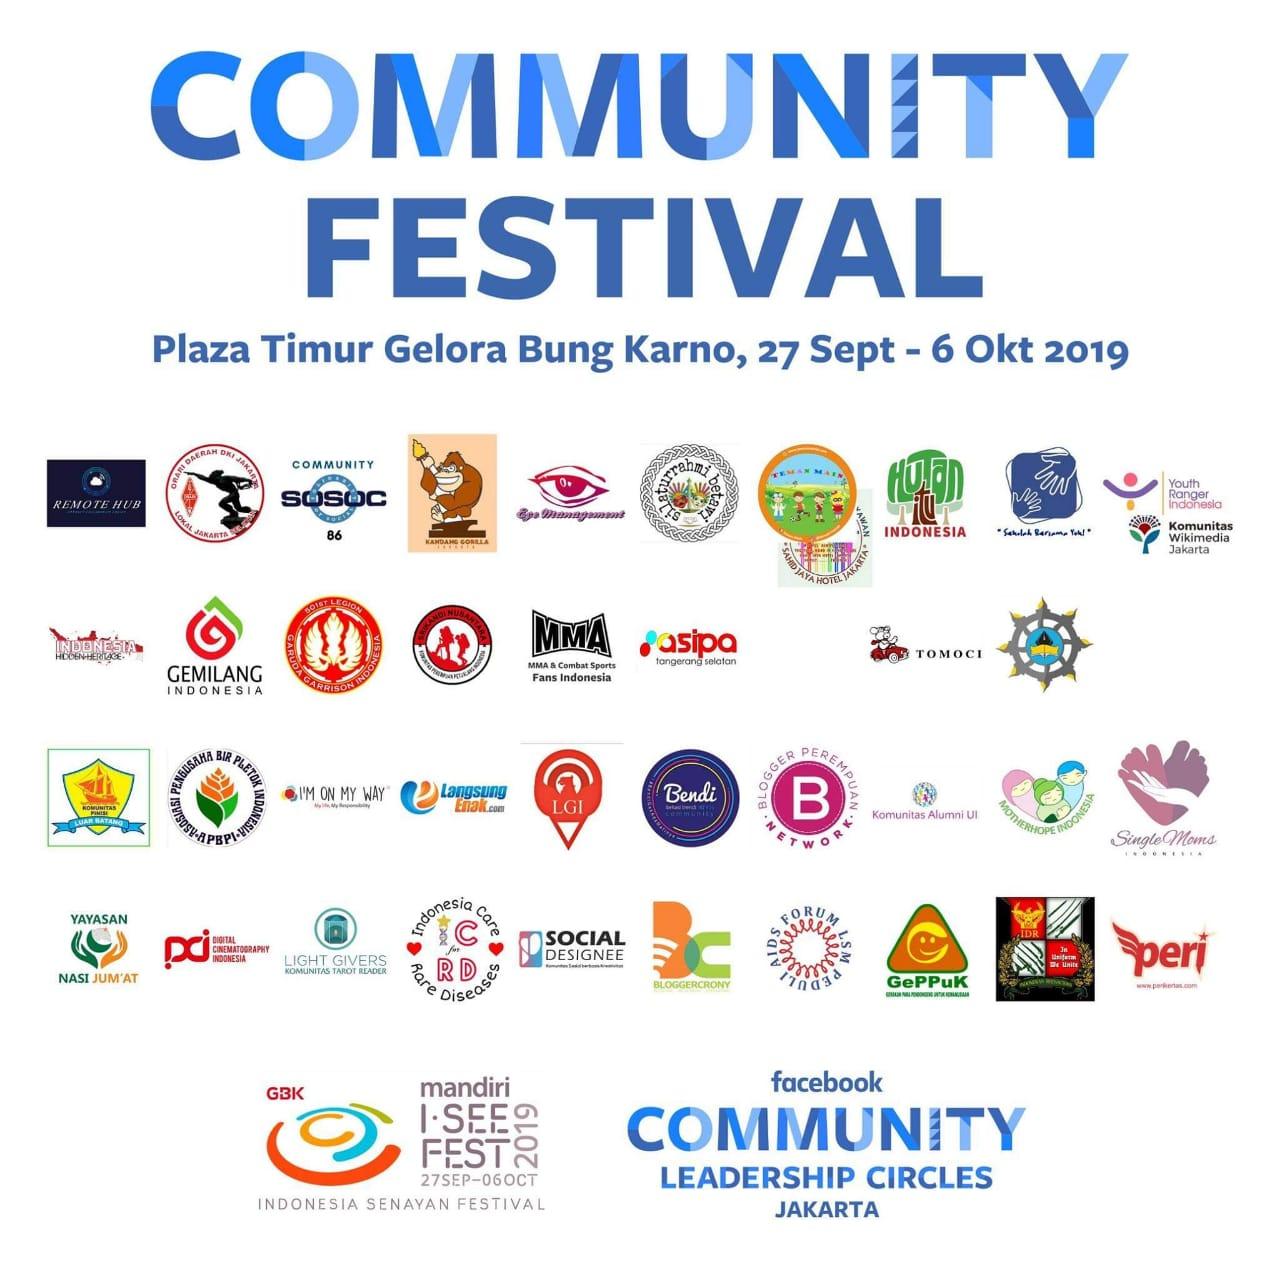 I See Fest 2019 bersama komunitas